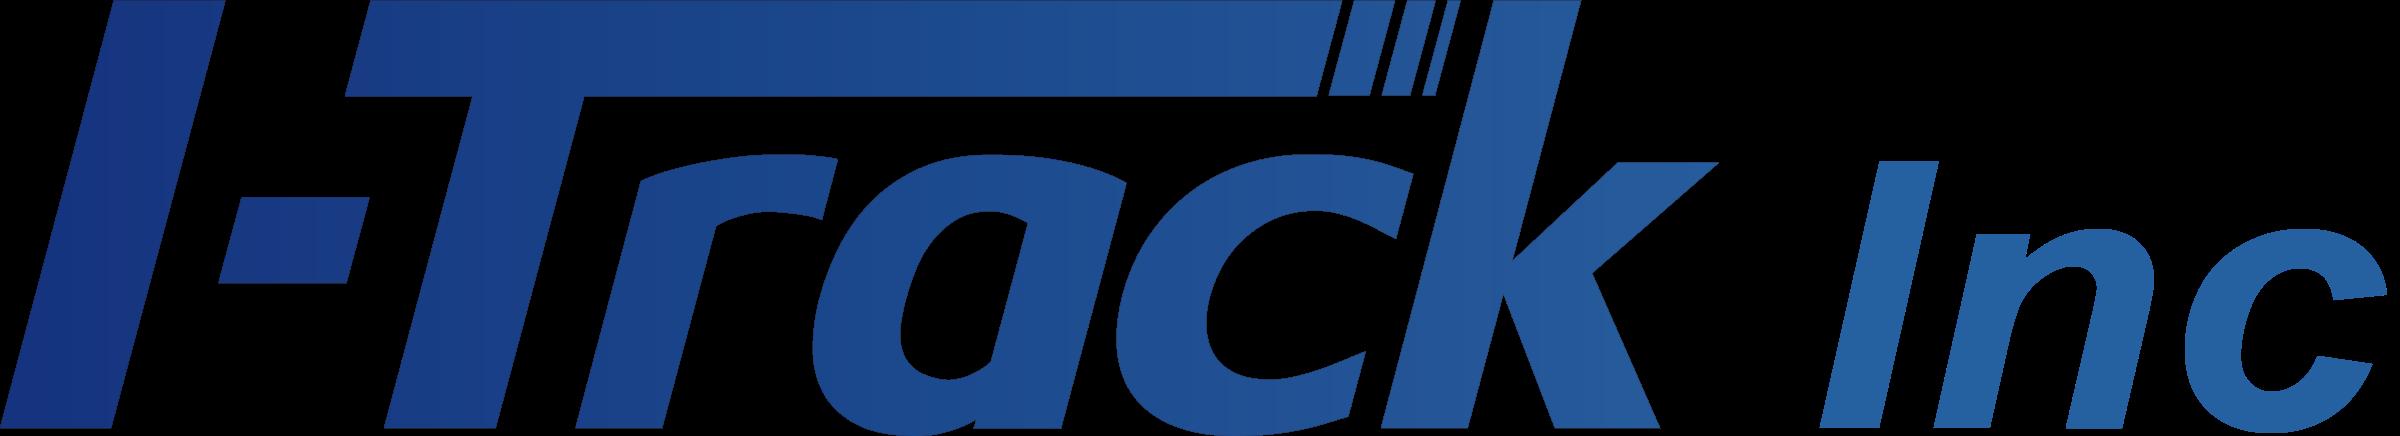 ToolTrack MES logo